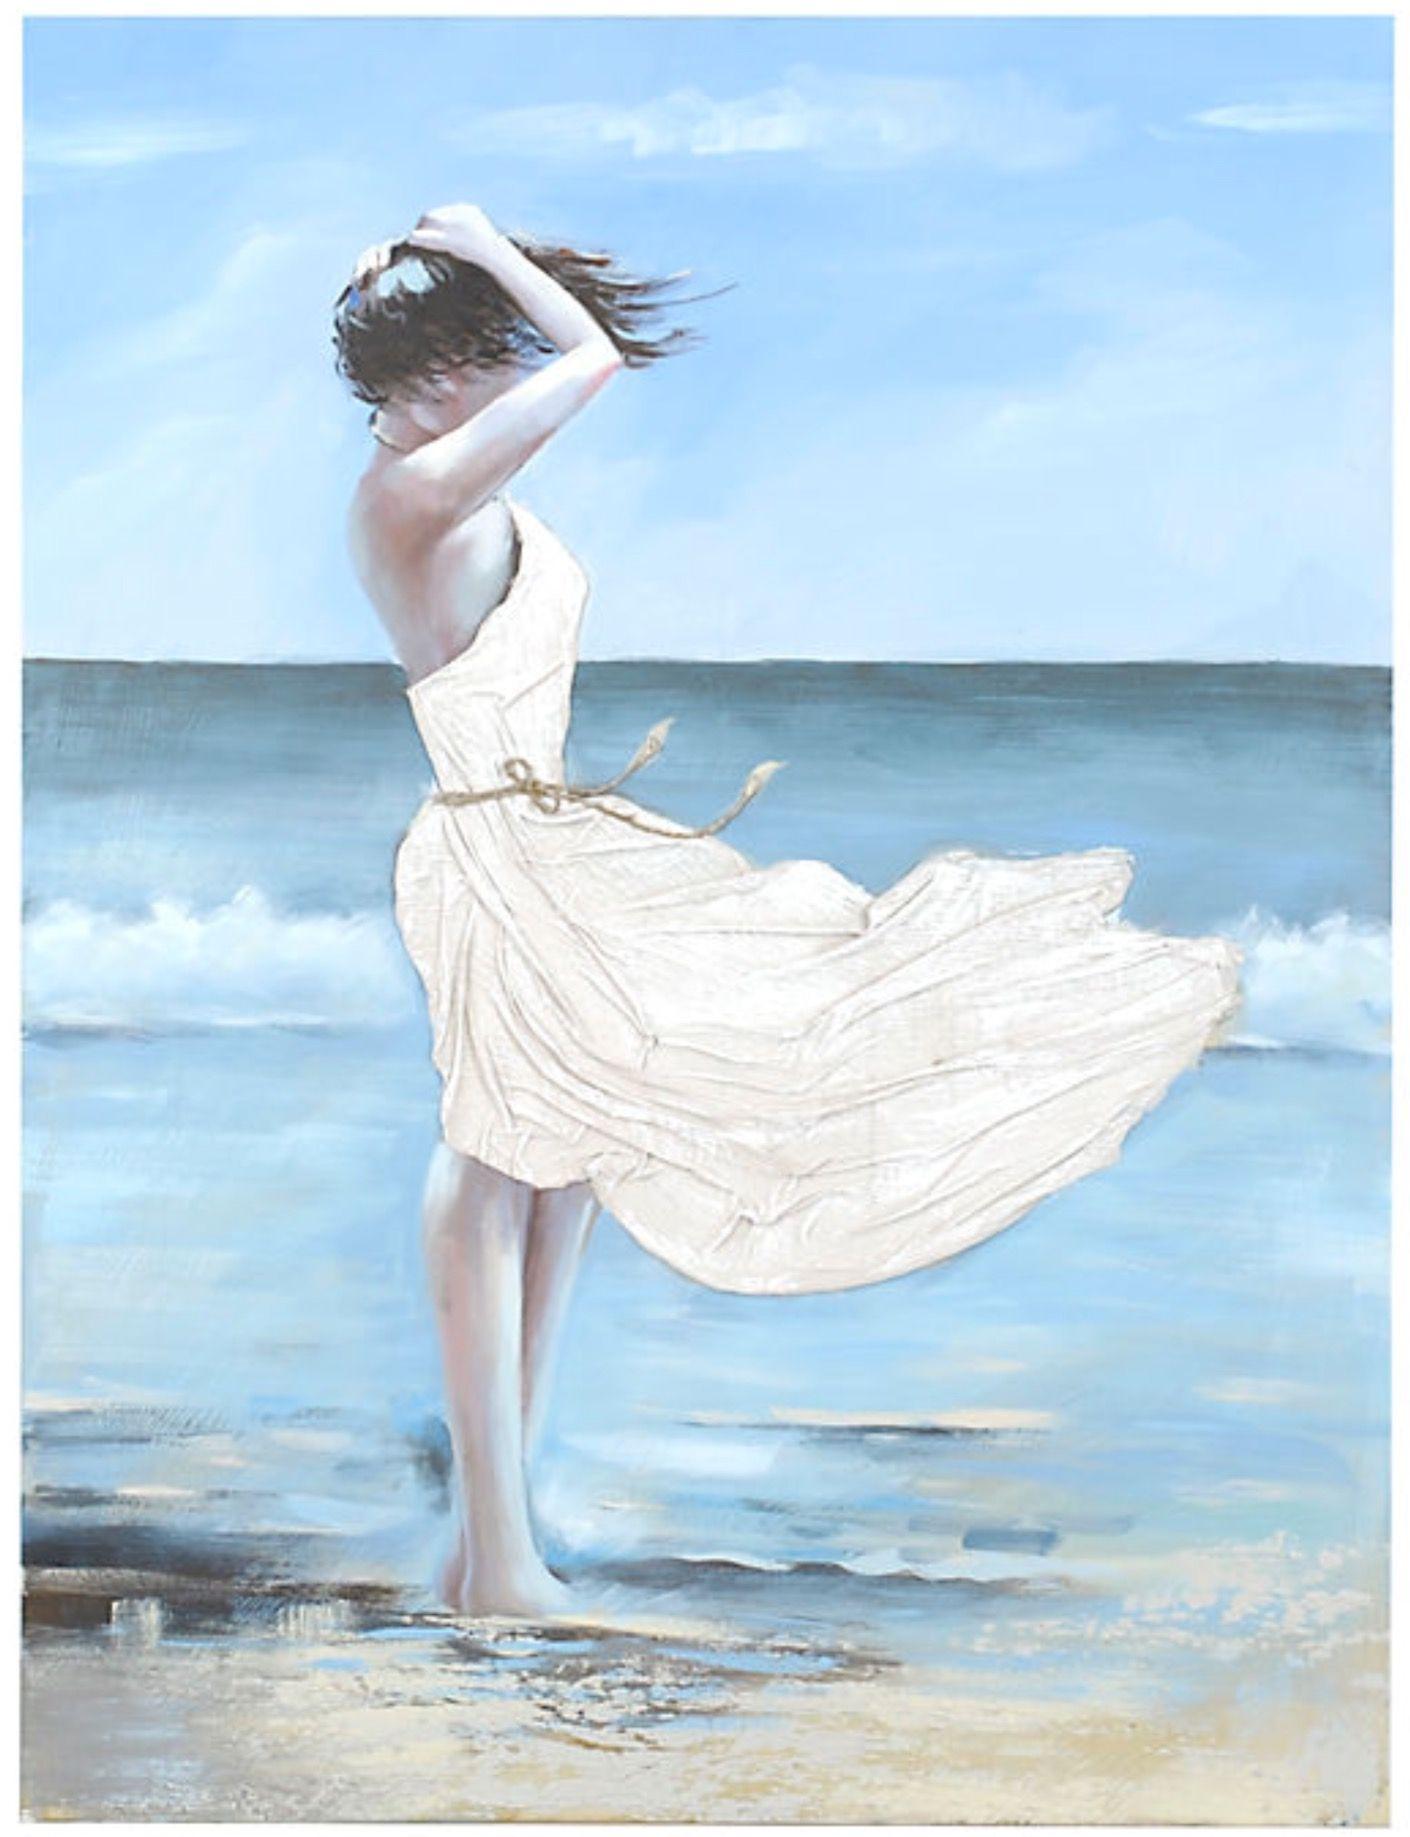 Pin on art inspiration. Windy clipart windy beach